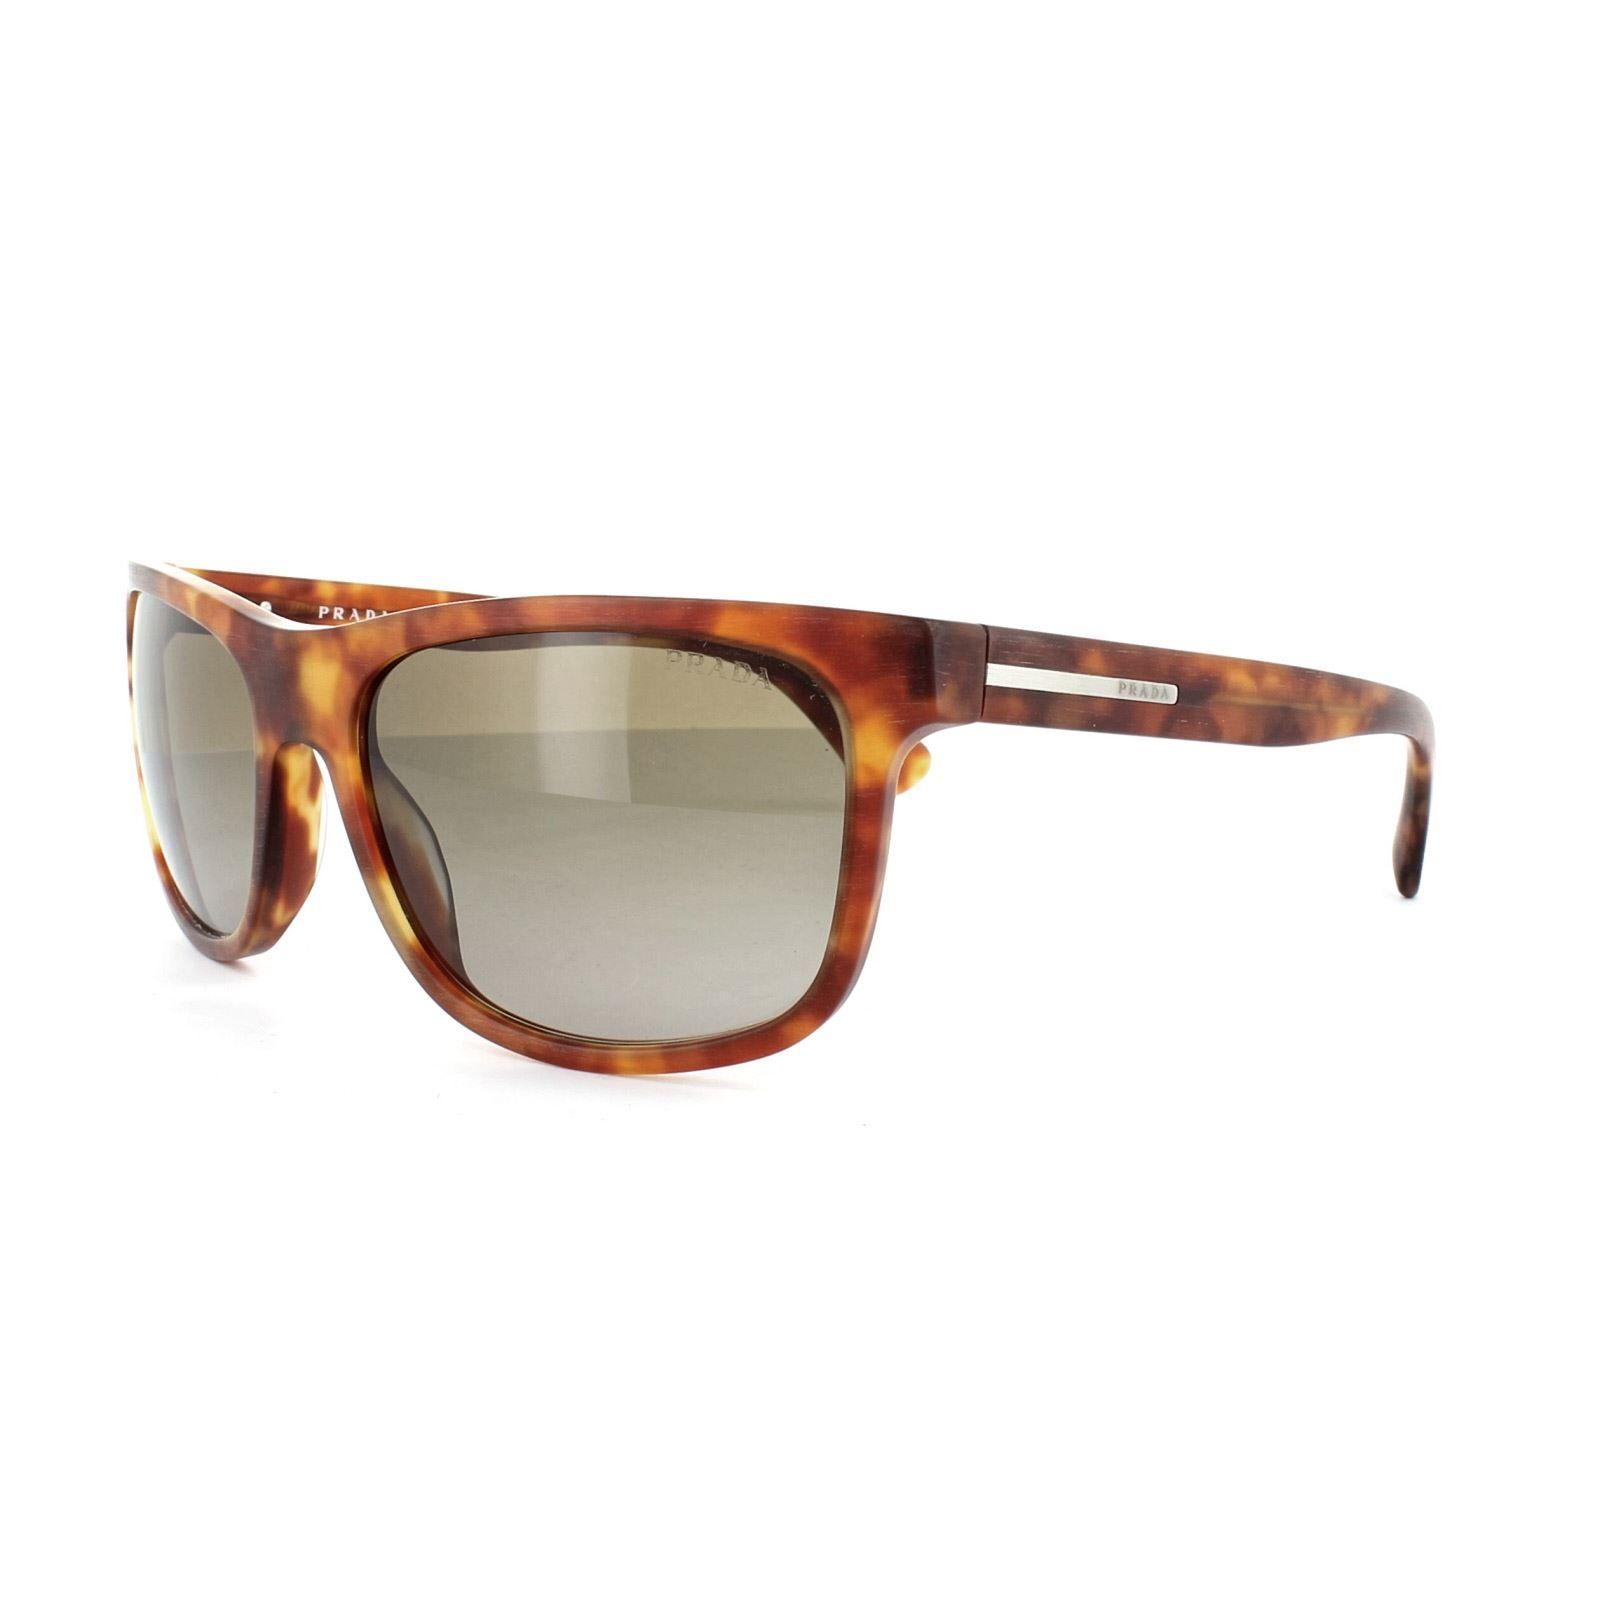 Prada Sunglasses 15RS TWO1X1 Matt Brushed Light Havana Brown Gradient